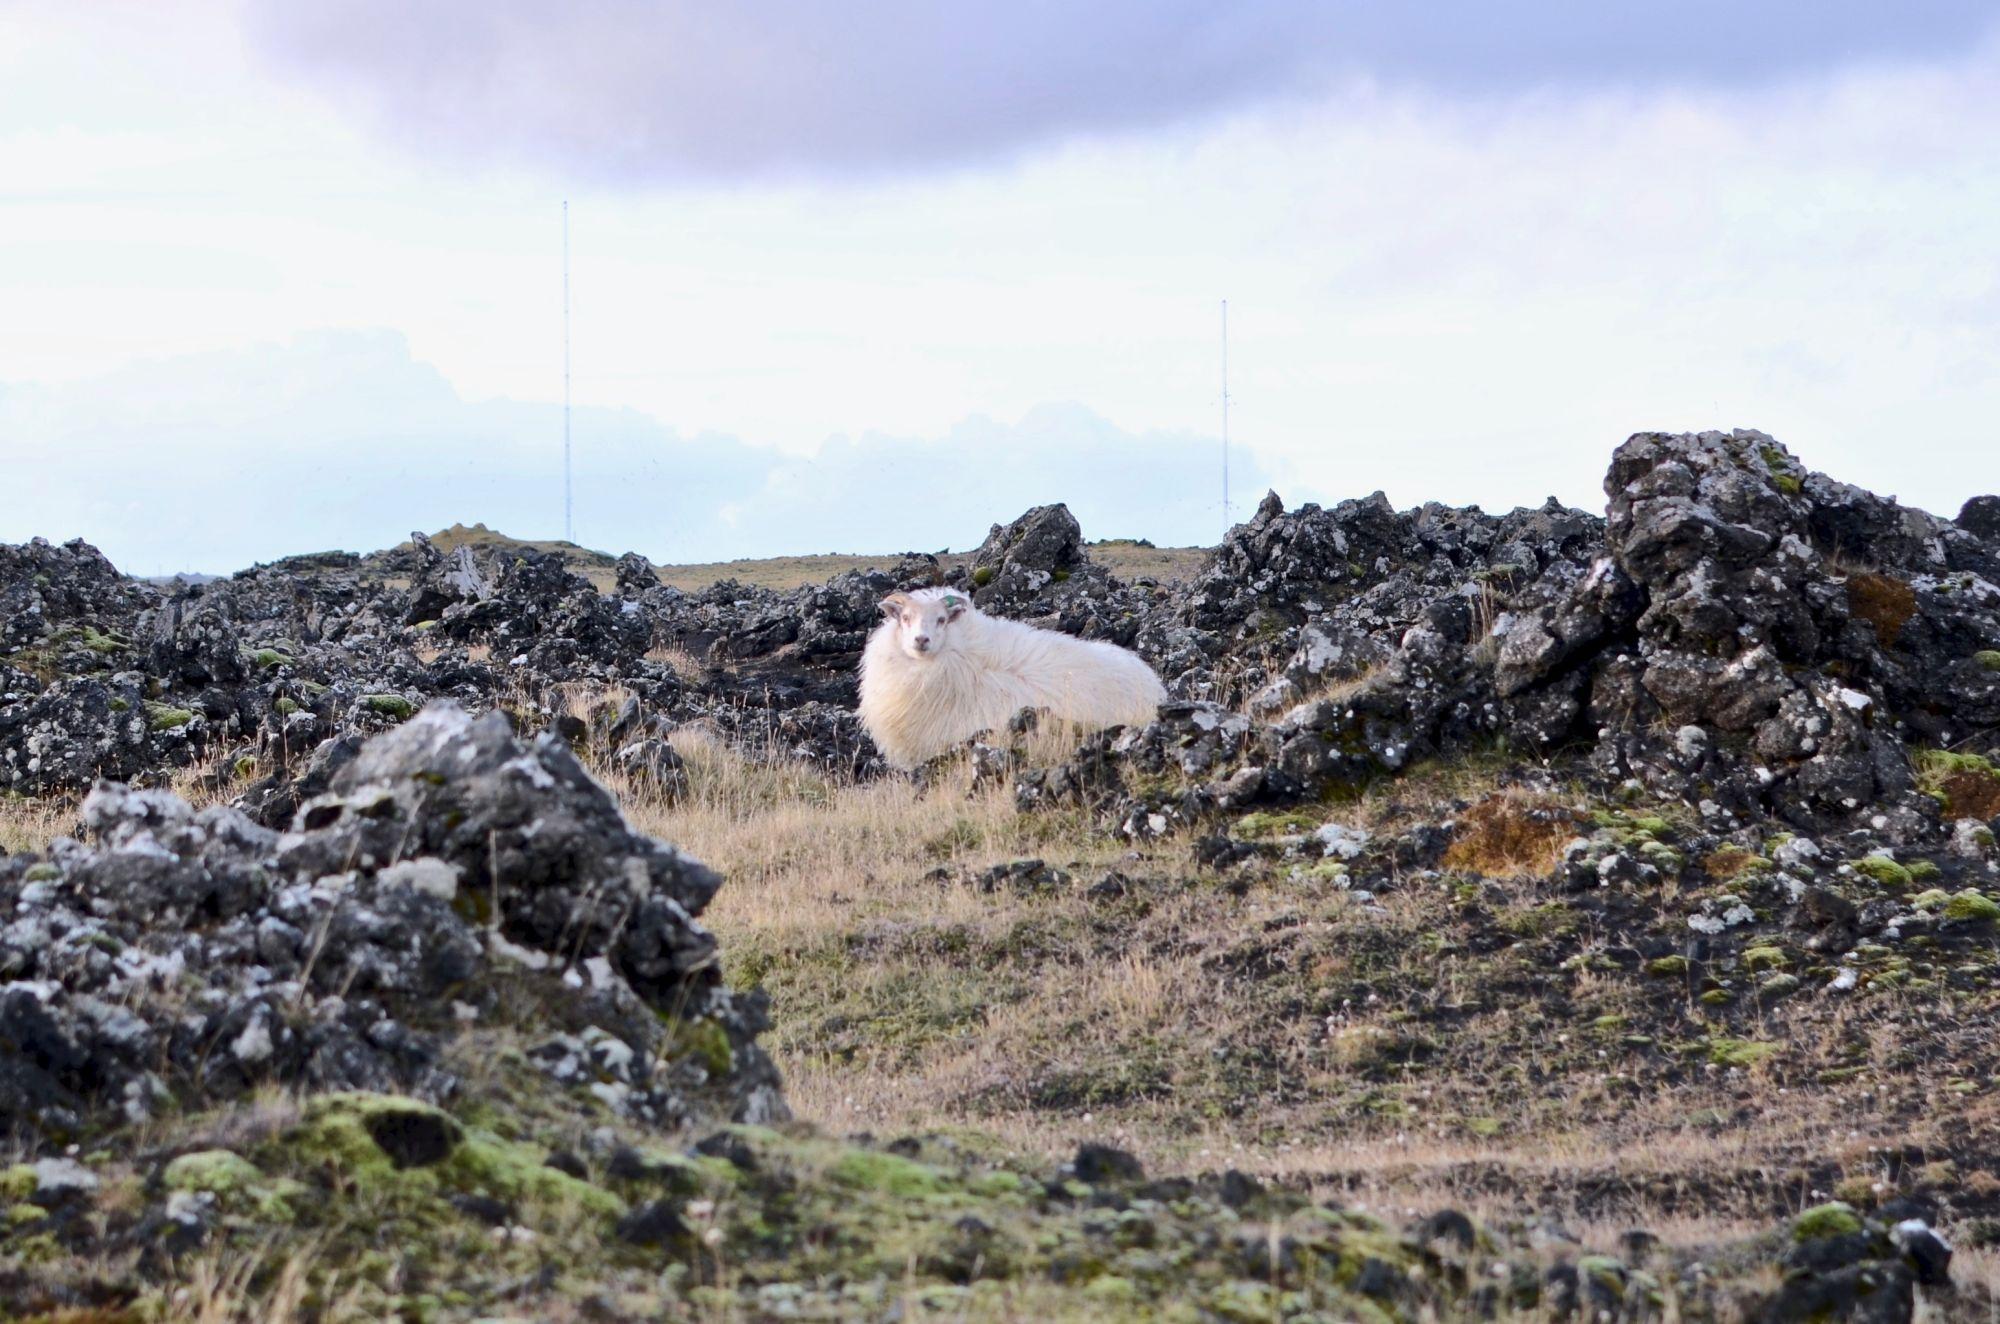 Iceland Honeymoon Tours 2019 - 2020 -  sheep rocks